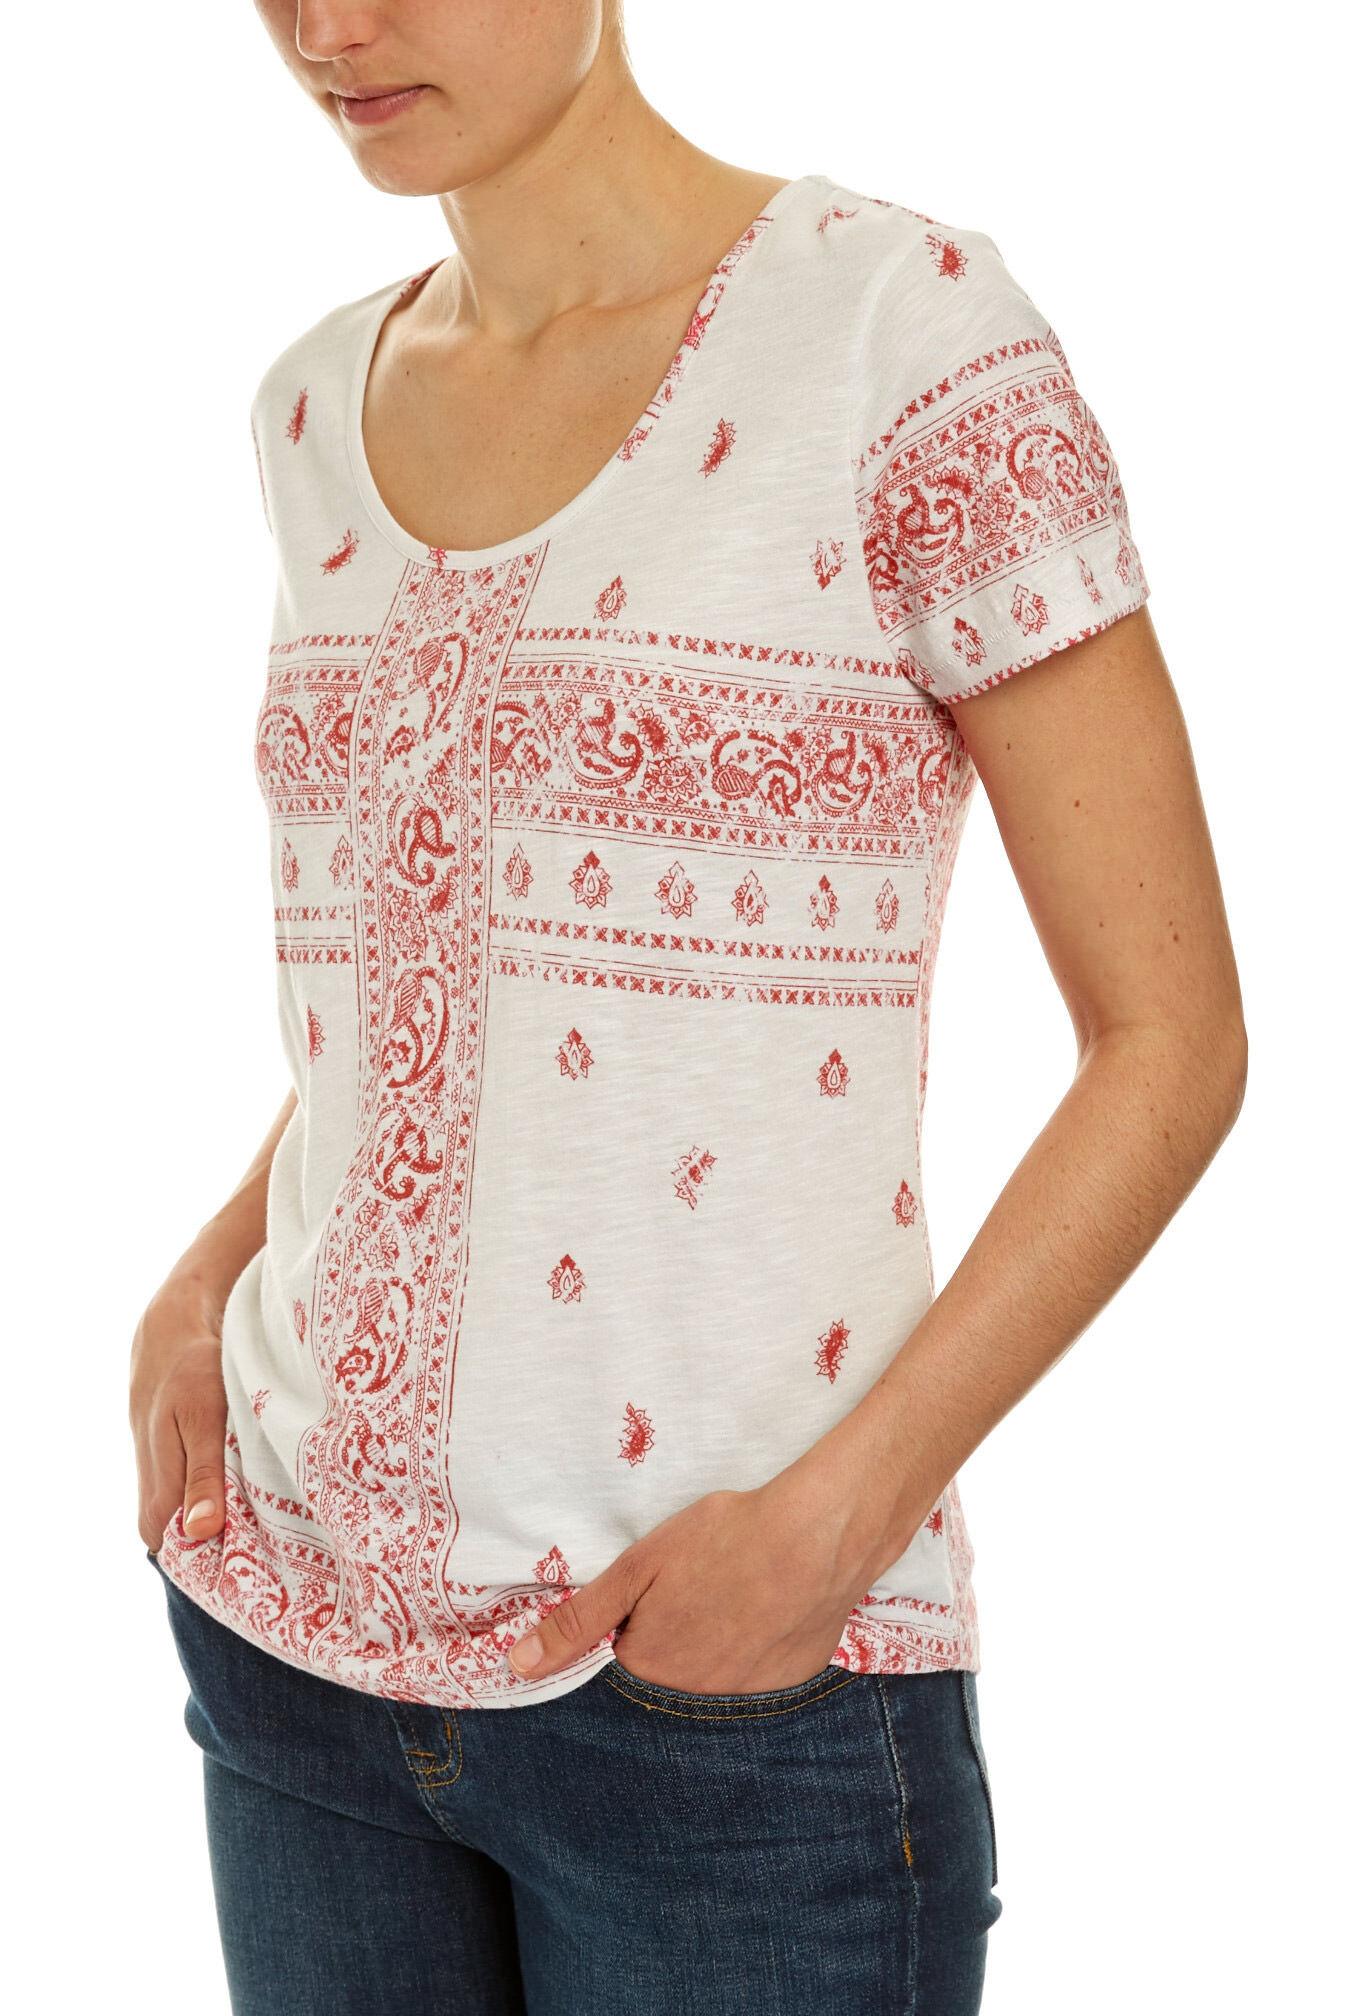 NEW-JAG-WOMENS-Scarf-Print-Tee-T-Shirts